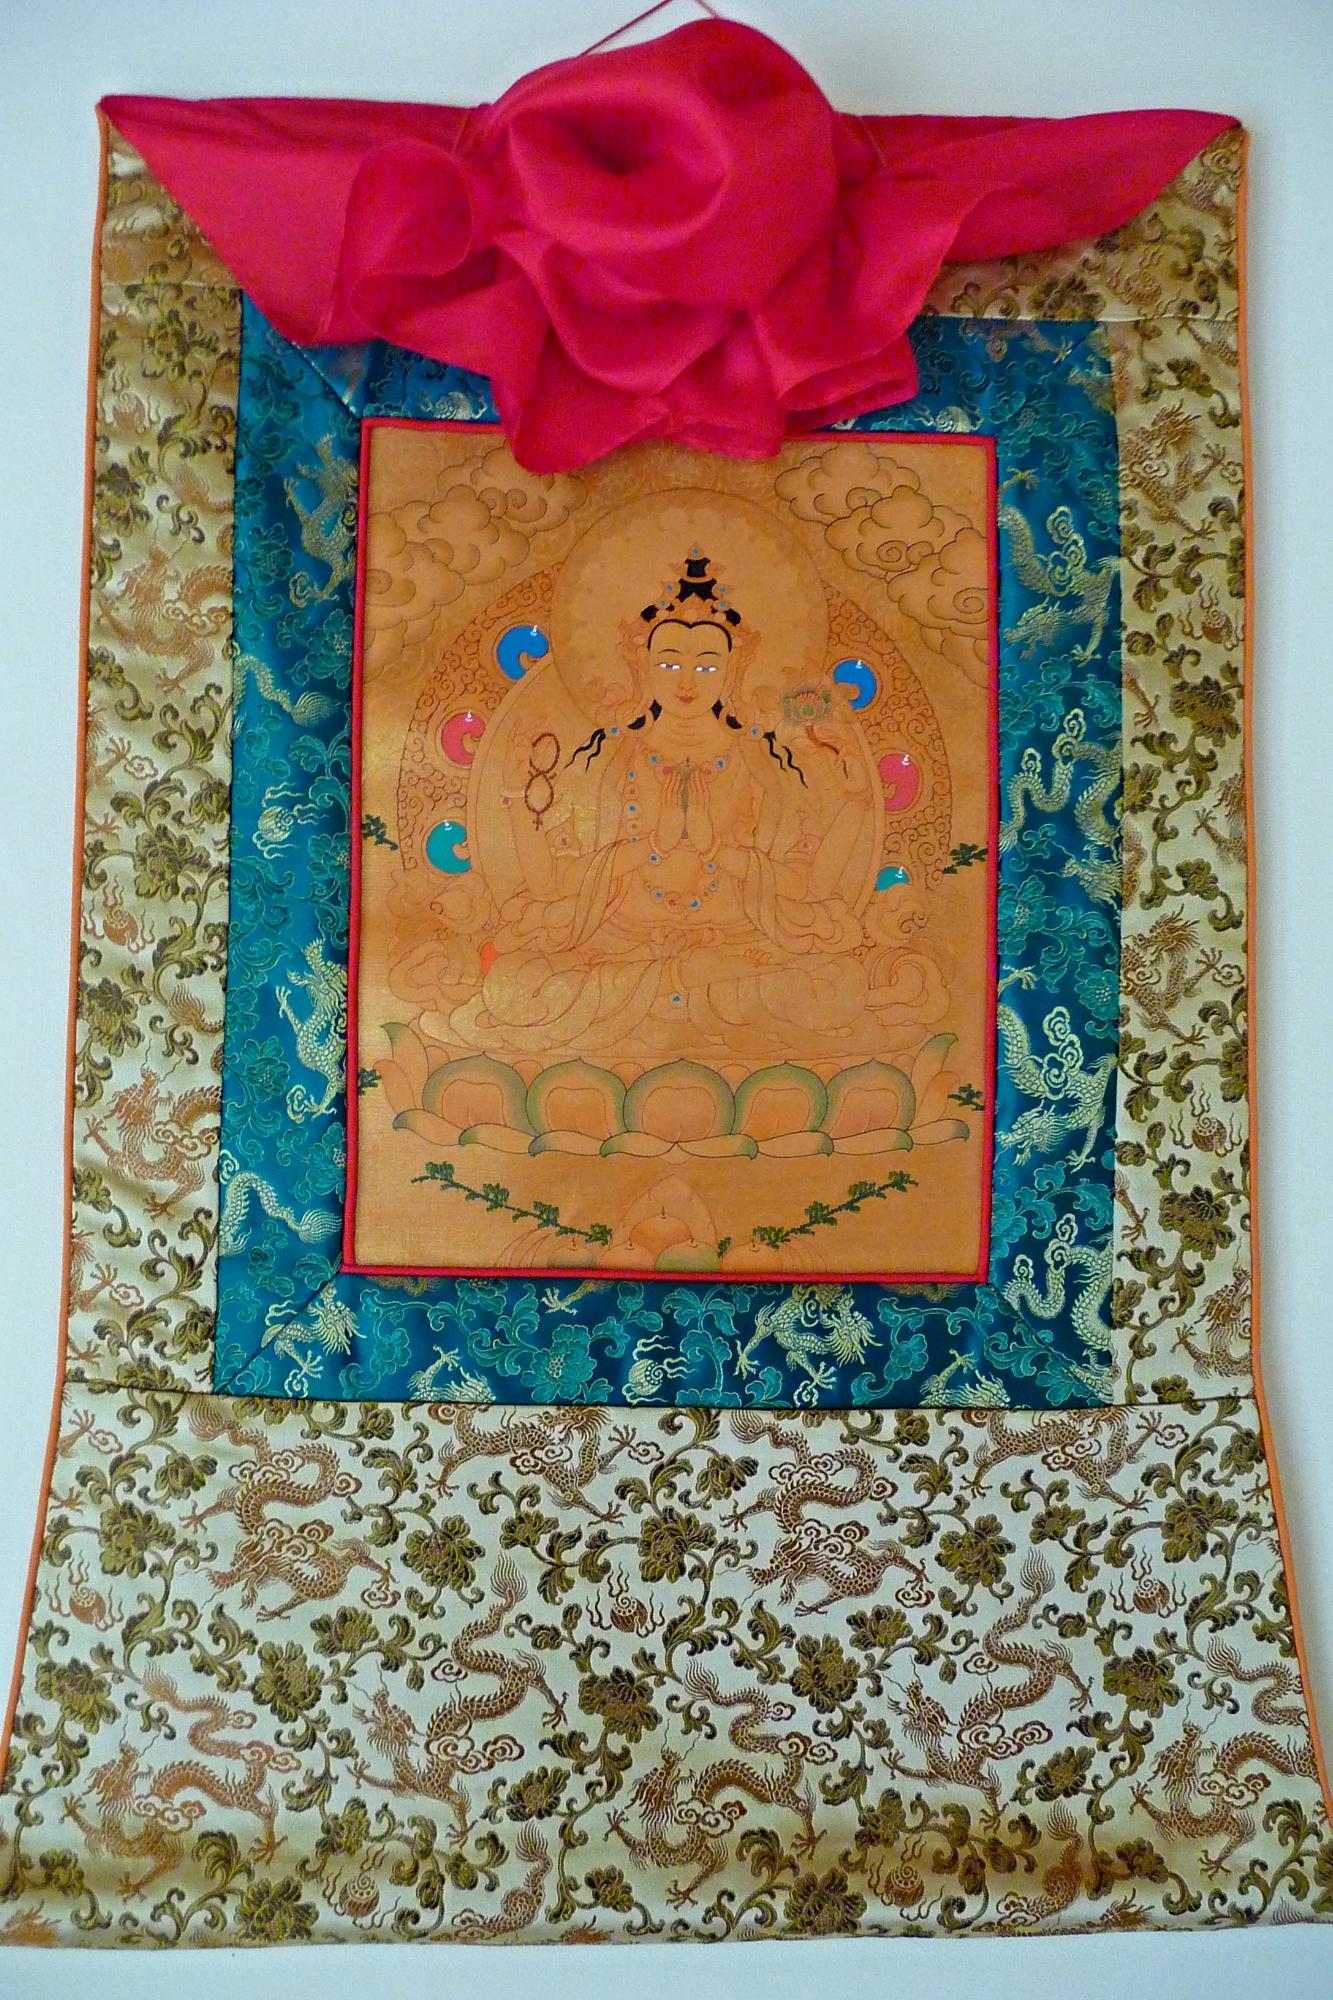 Brocade Frame for Small Chenrezig Thangka